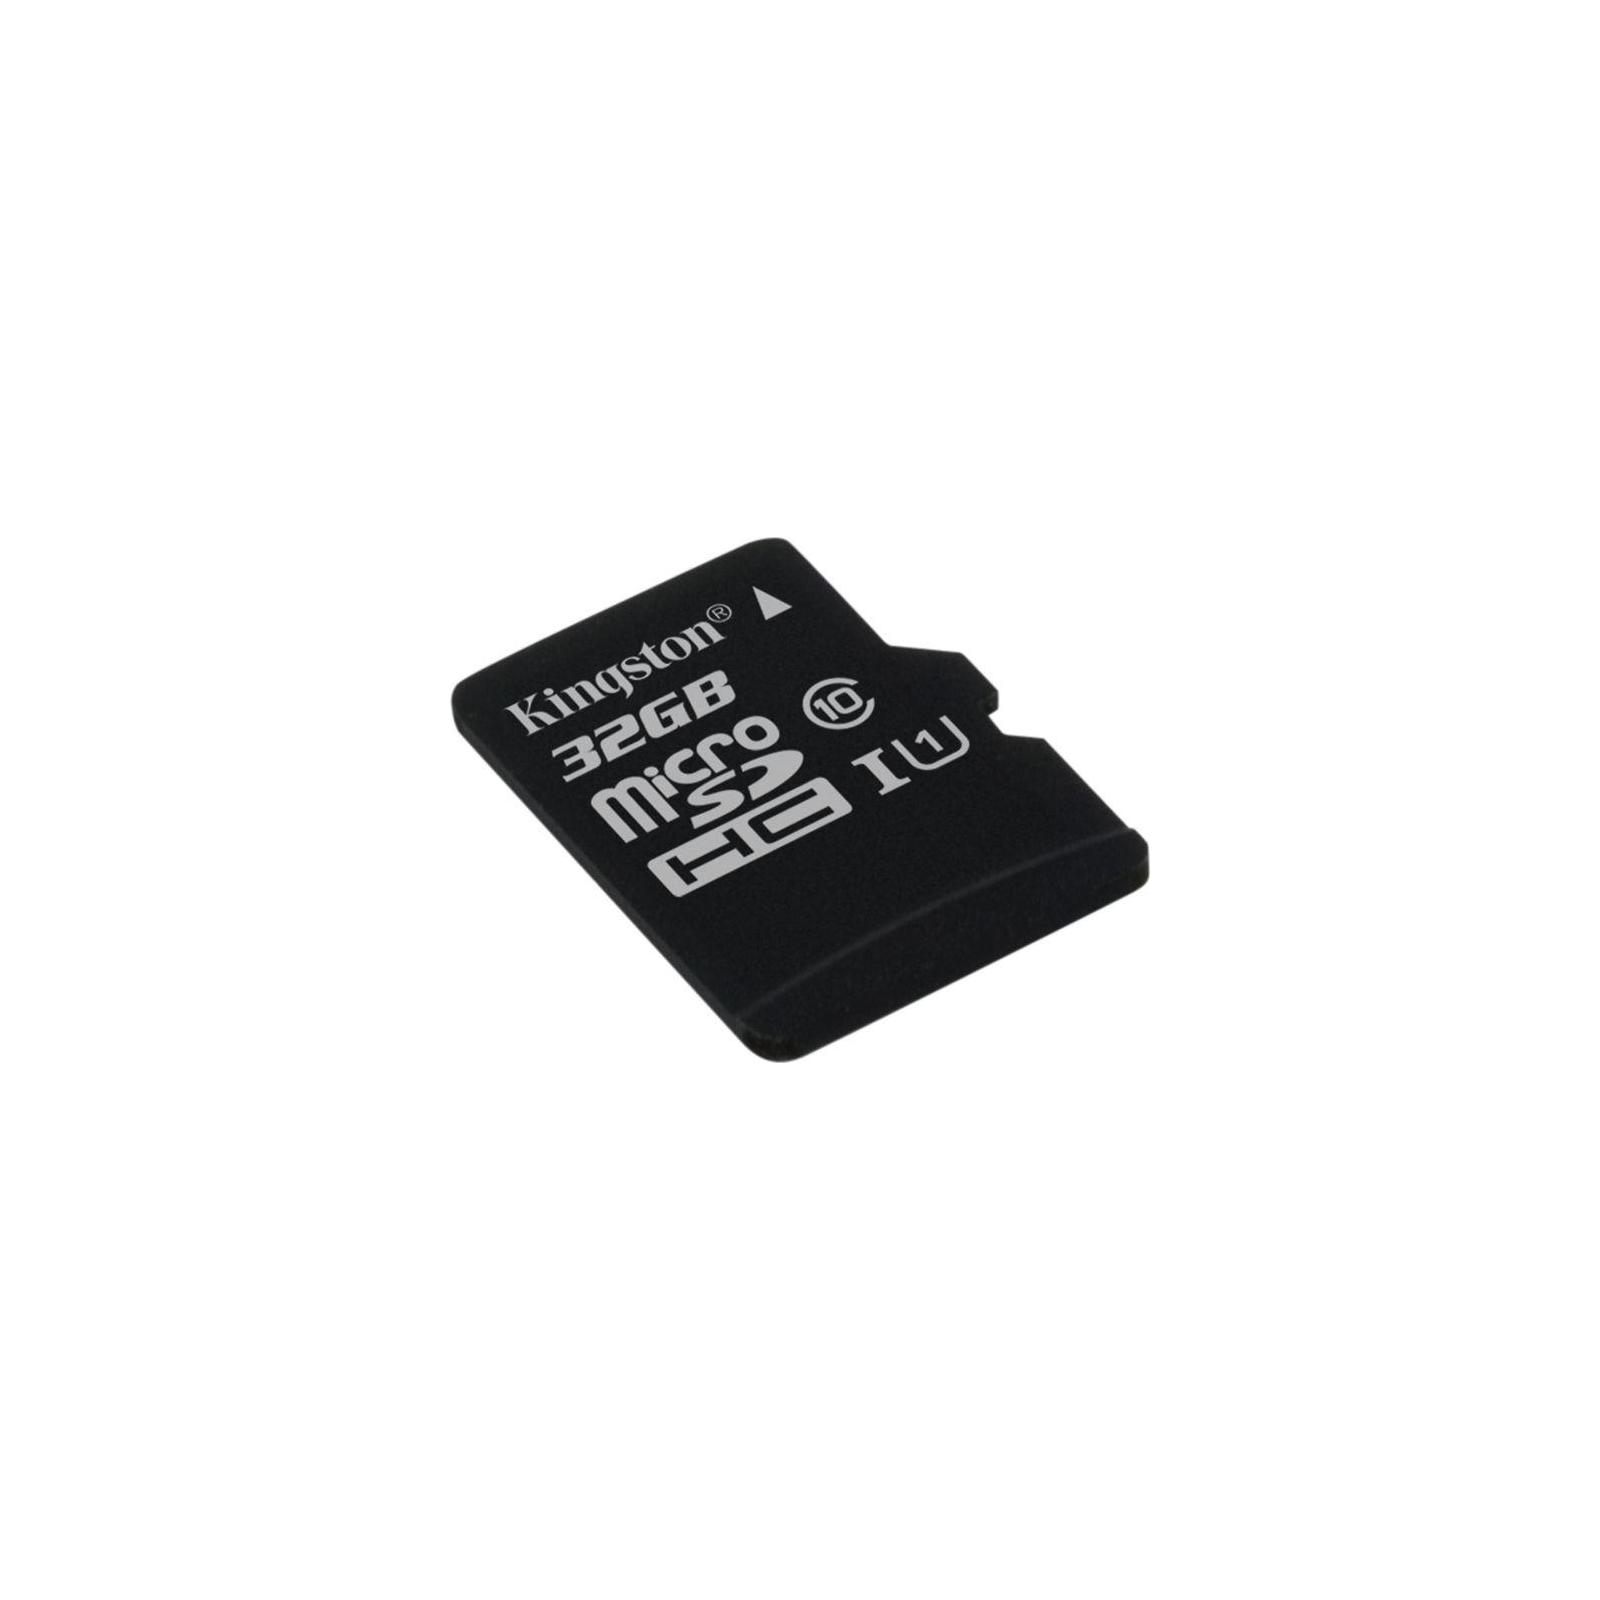 Карта памяти Kingston 32GB microSDHC class 10 UHS-I (SDCS/32GBSP) изображение 2